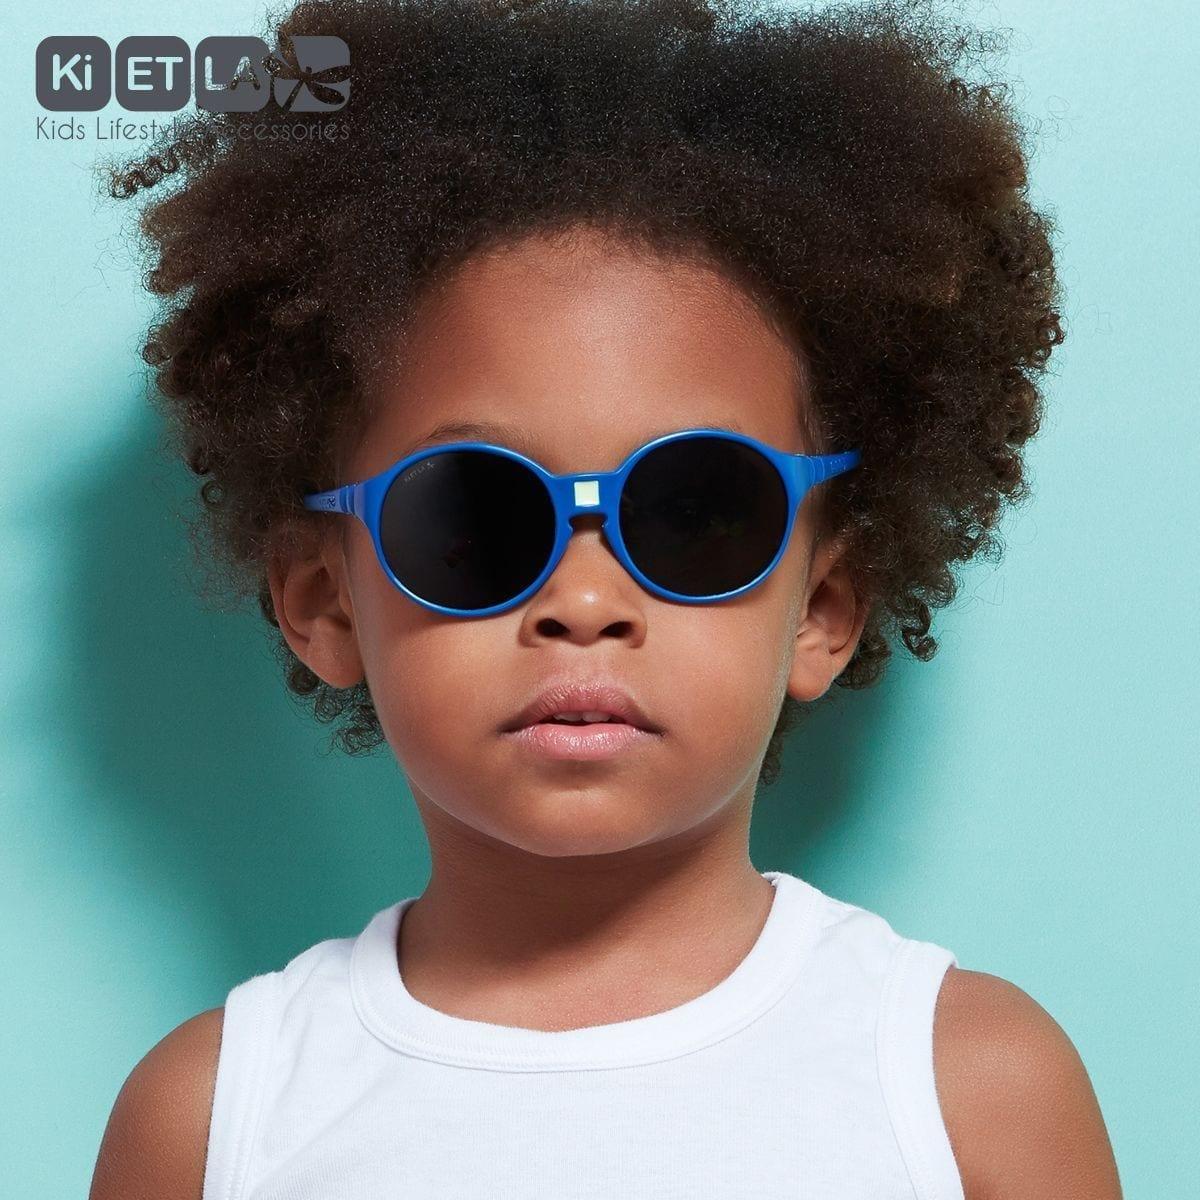 72bbd65aaa3361 Ki et La Lunettes 4 à 6 ans Jokakids Bleu Roi   Babygreen